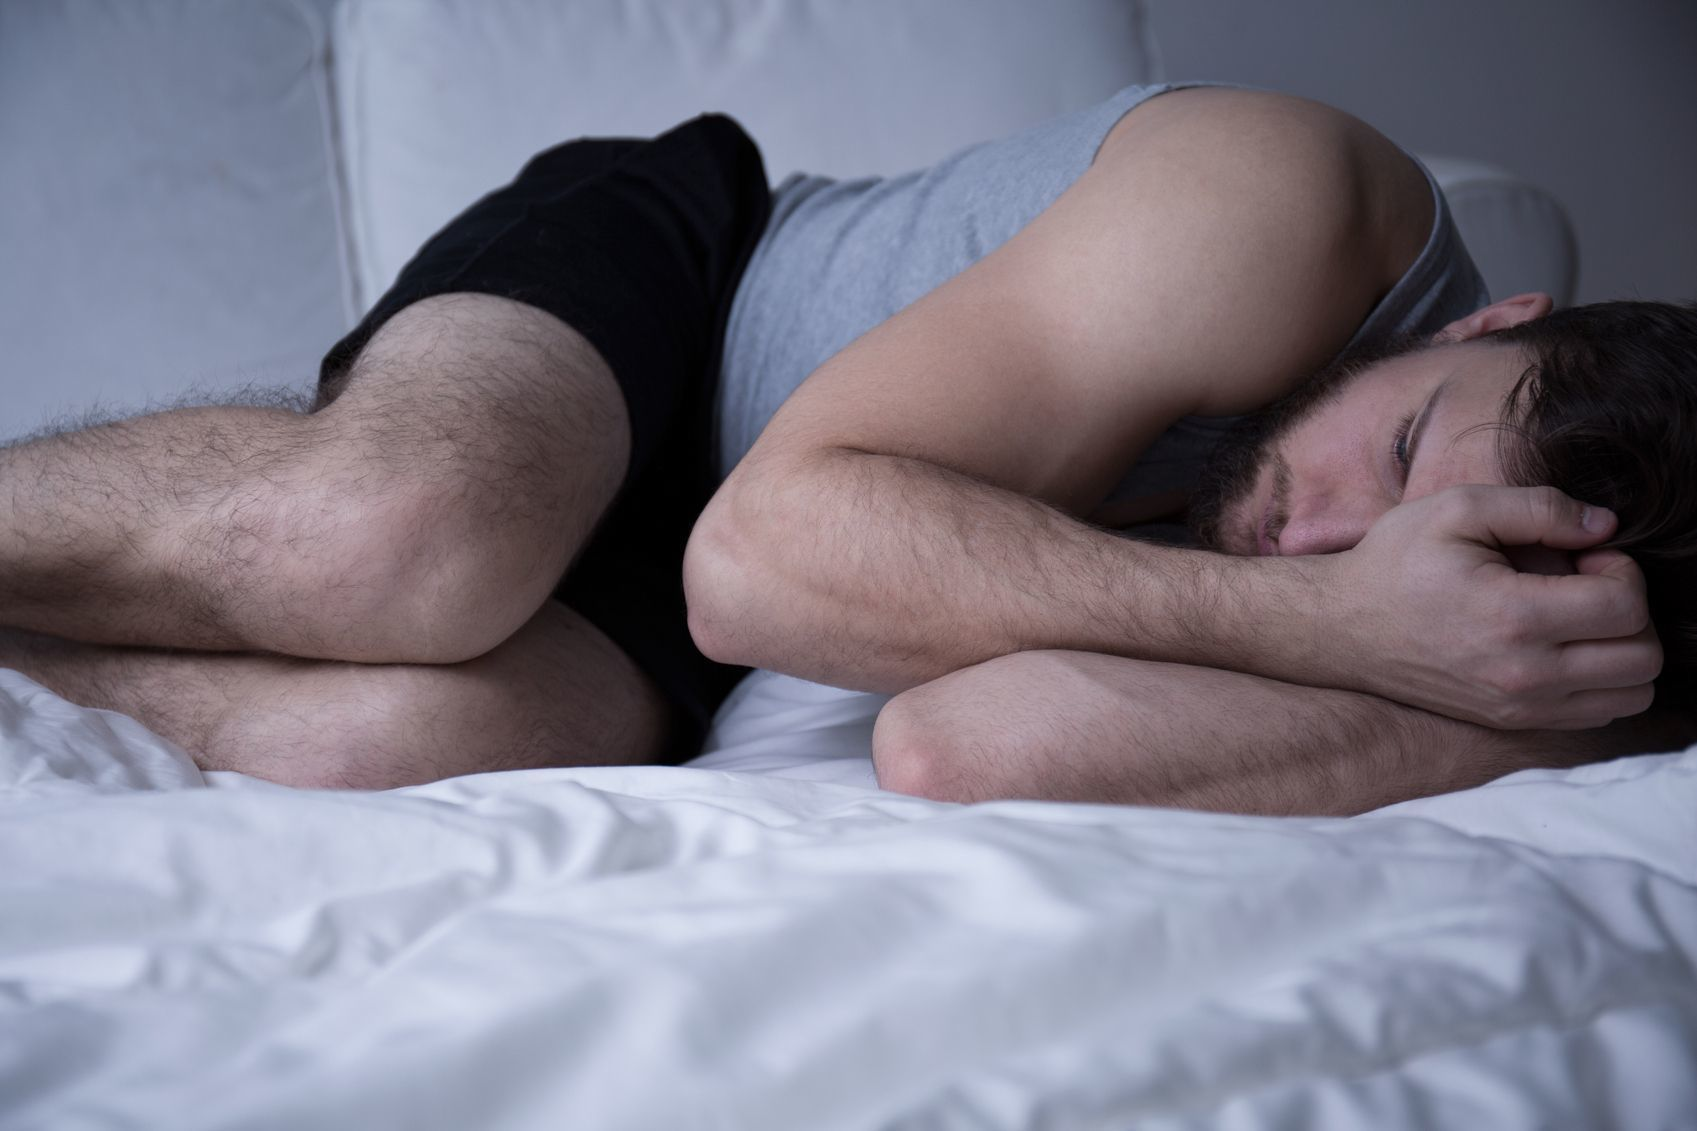 O字ハゲ(頭頂部ハゲ/つむじハゲ) 睡眠不足